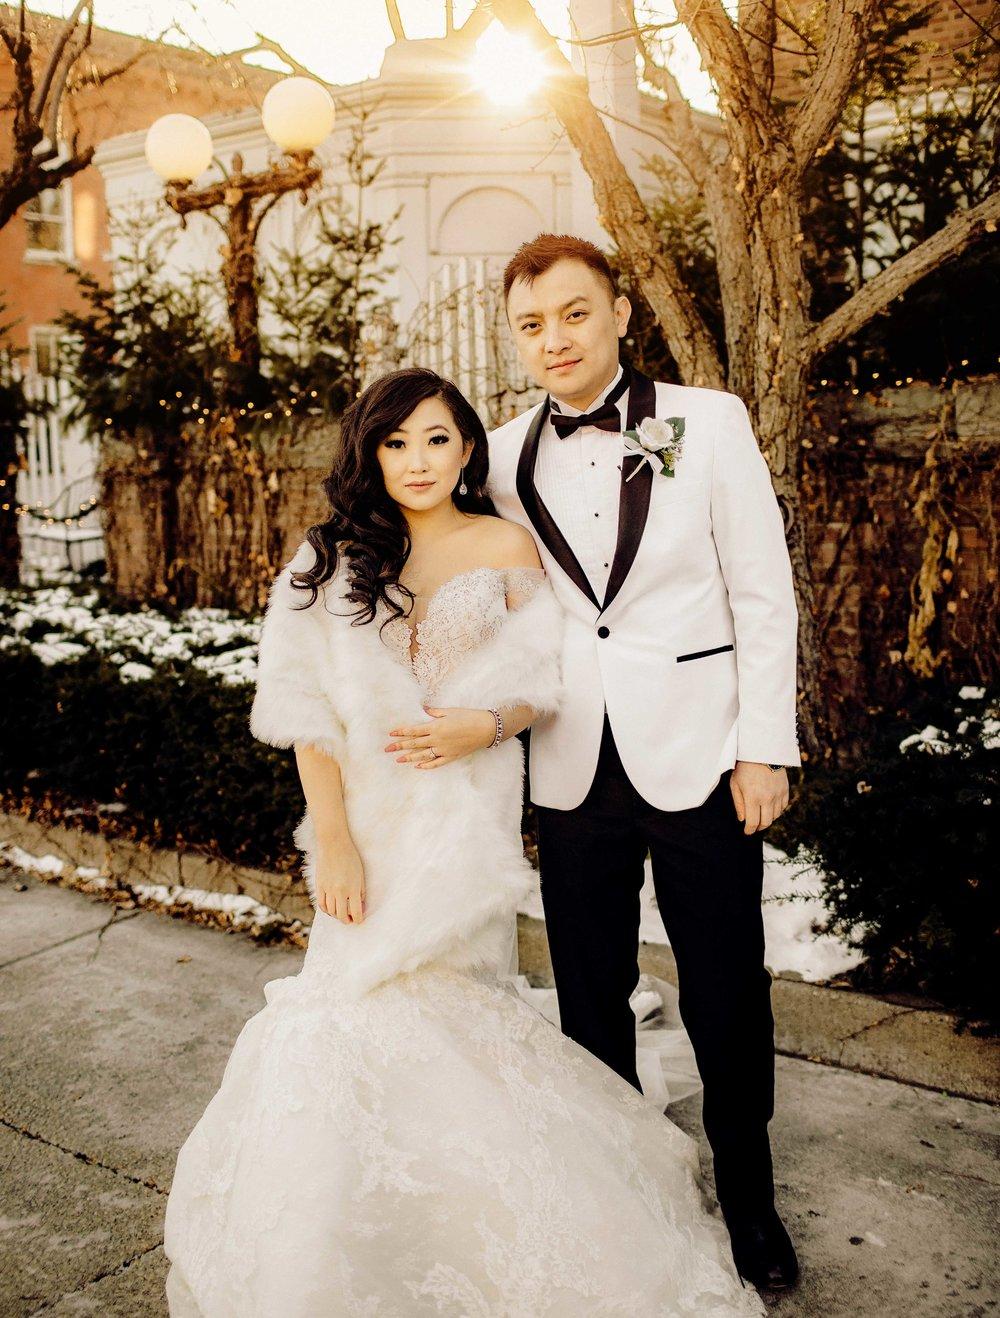 Honey + Yao, Part II, The Bride and Groom-67.jpg